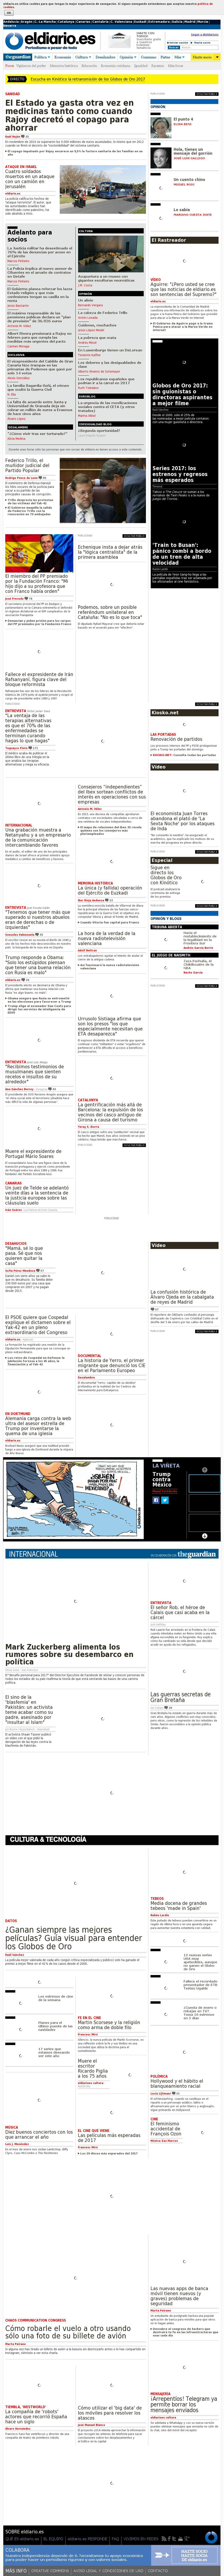 El Diario at Monday Jan. 9, 2017, 1:03 a.m. UTC